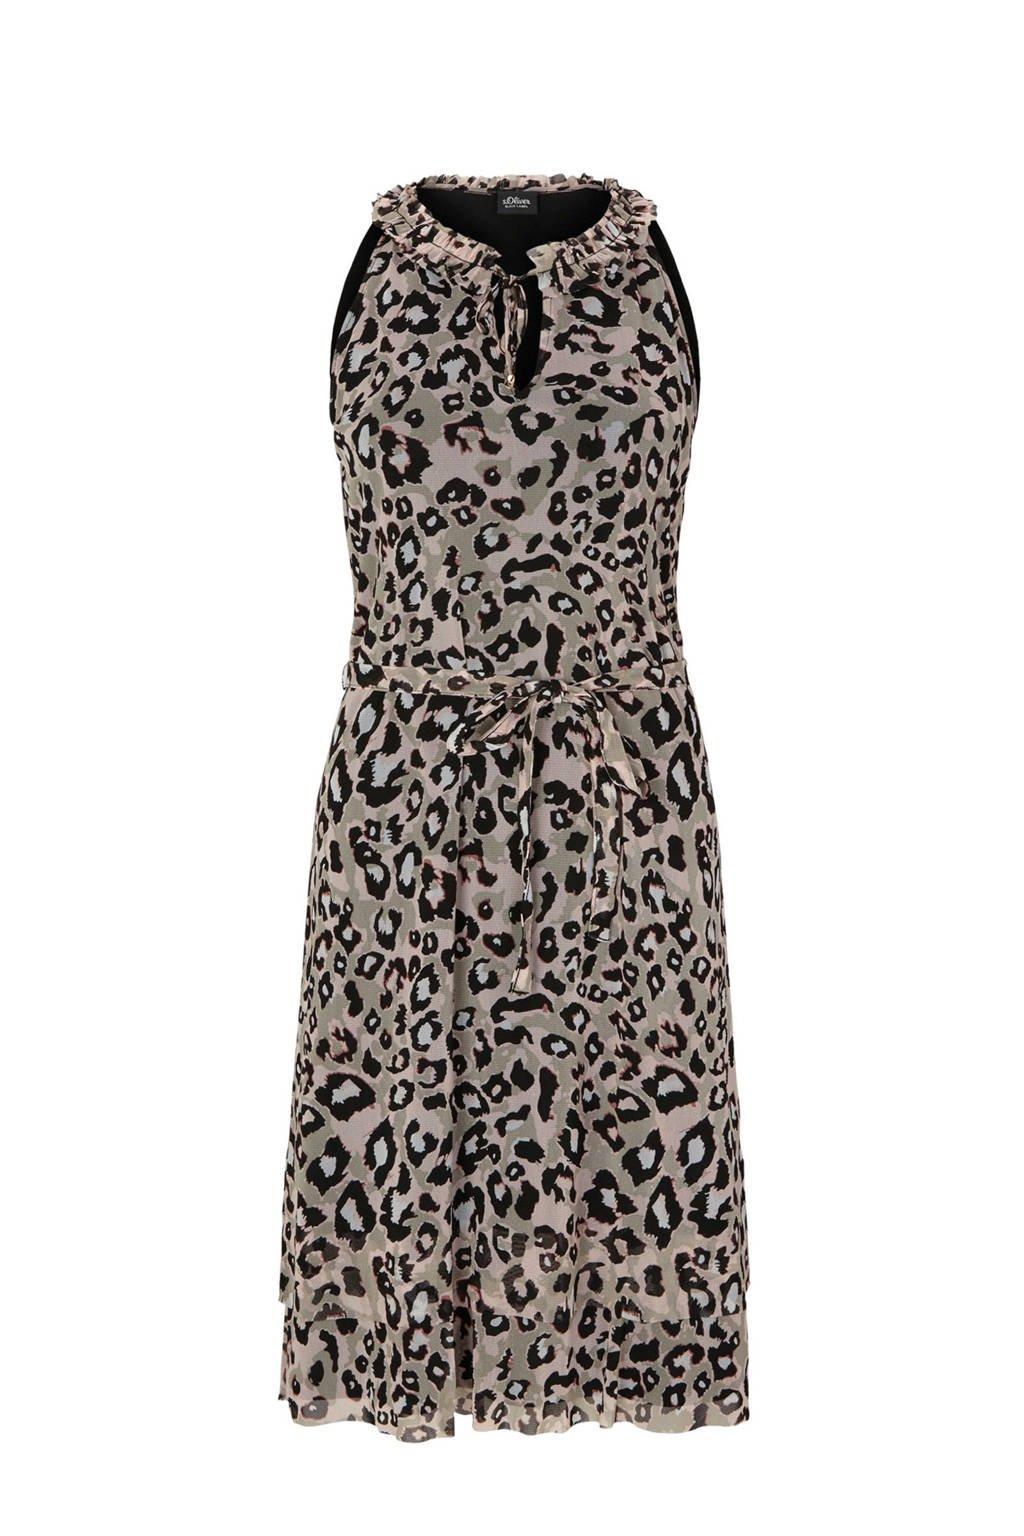 s.Oliver BLACK LABEL jurk met panterprint, Bruin